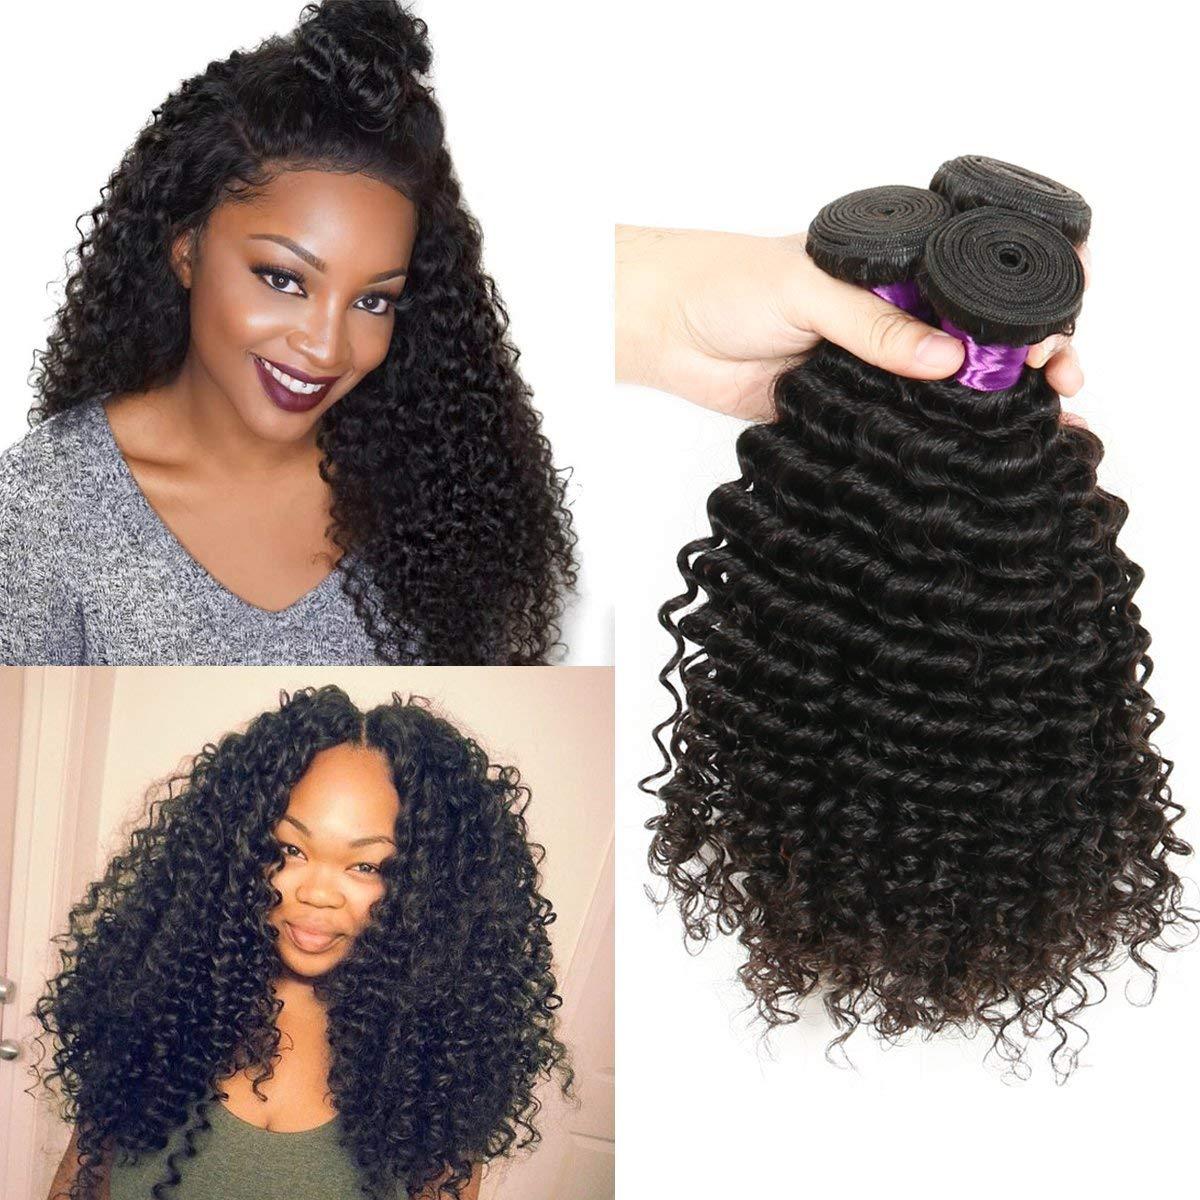 Brazilian Curly Hair Bundles Deep Wave Weave Hair Extensions Brazilian Deep Wave Human Hair 3 Bundles Bouncy Curl Hair 300g Brazilian Curly Hair (14 16 18)